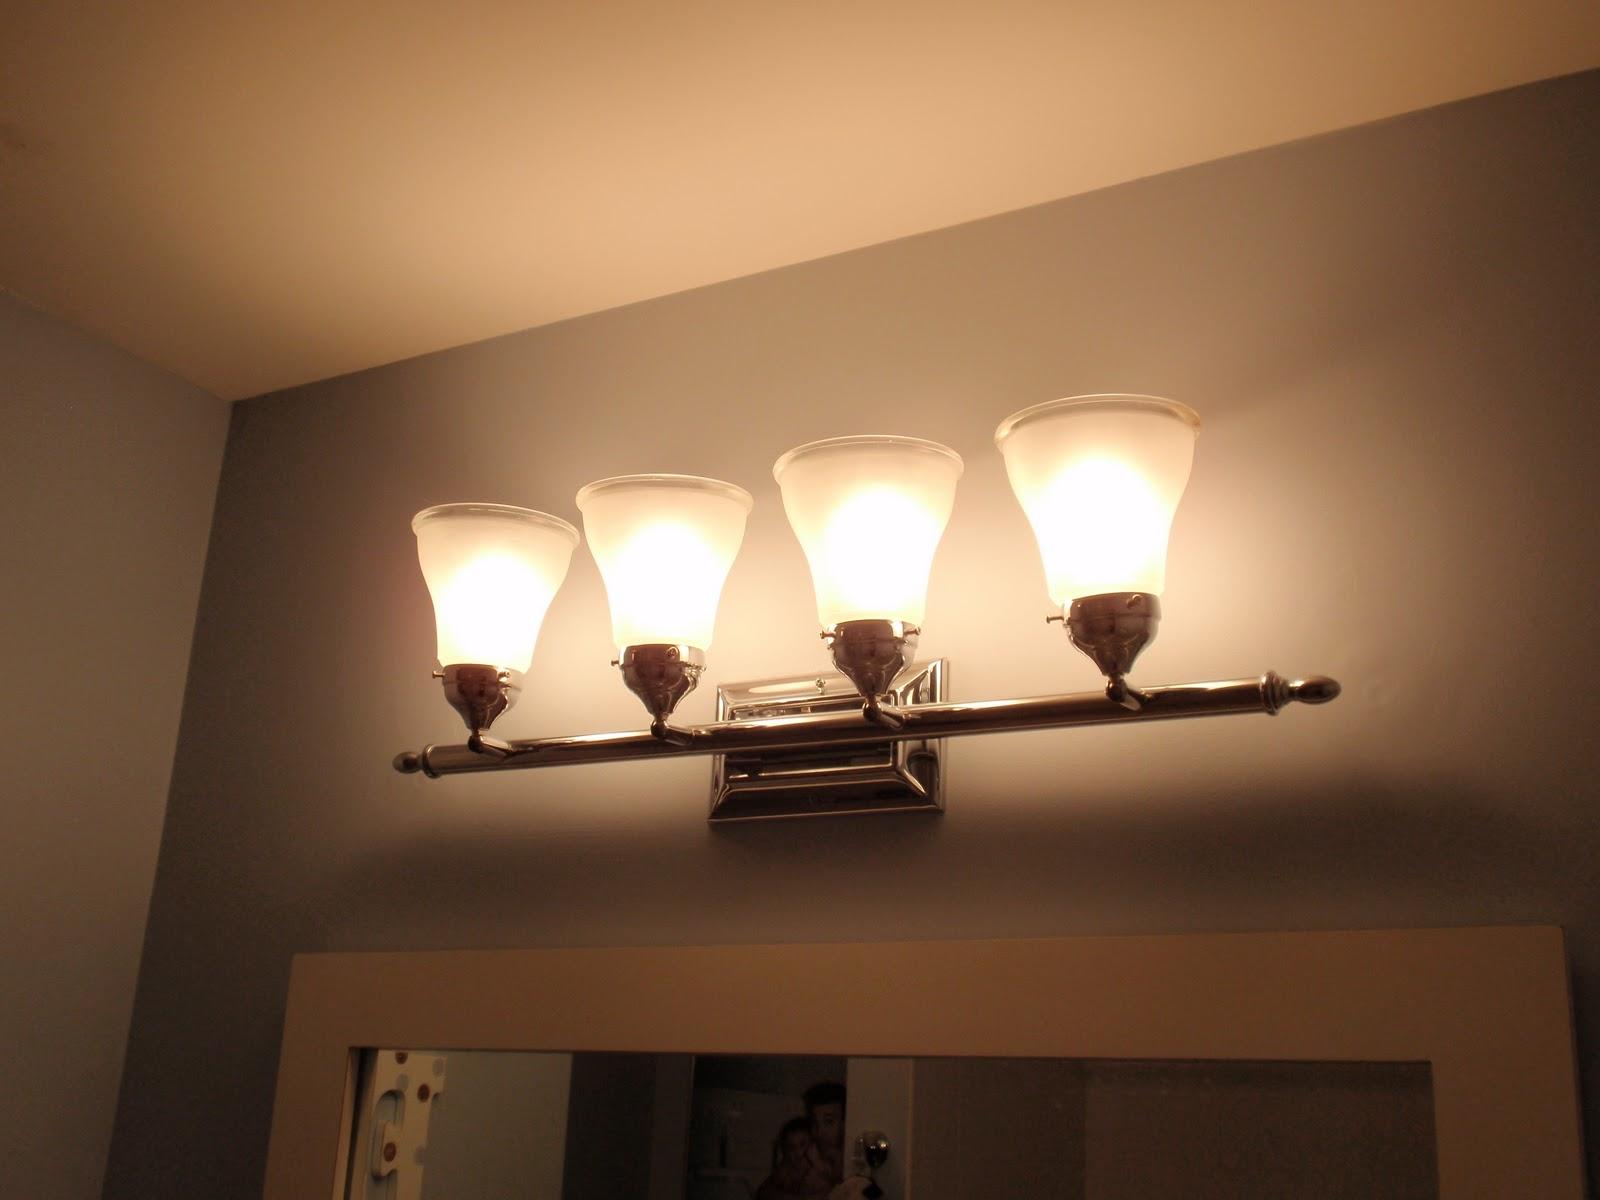 home depot ceiling light photo - 2